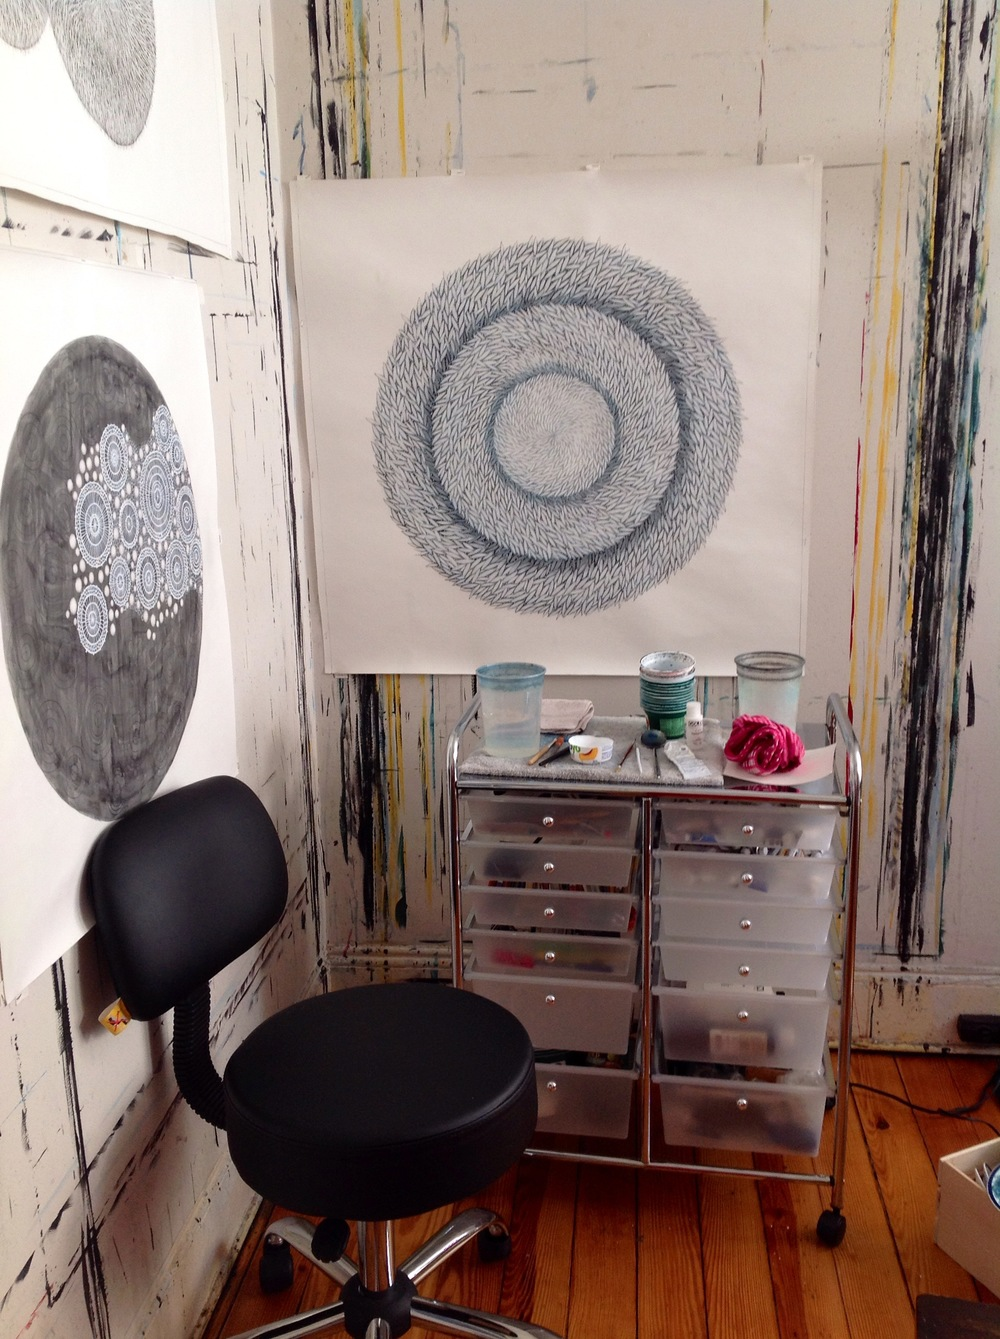 Inside her studio